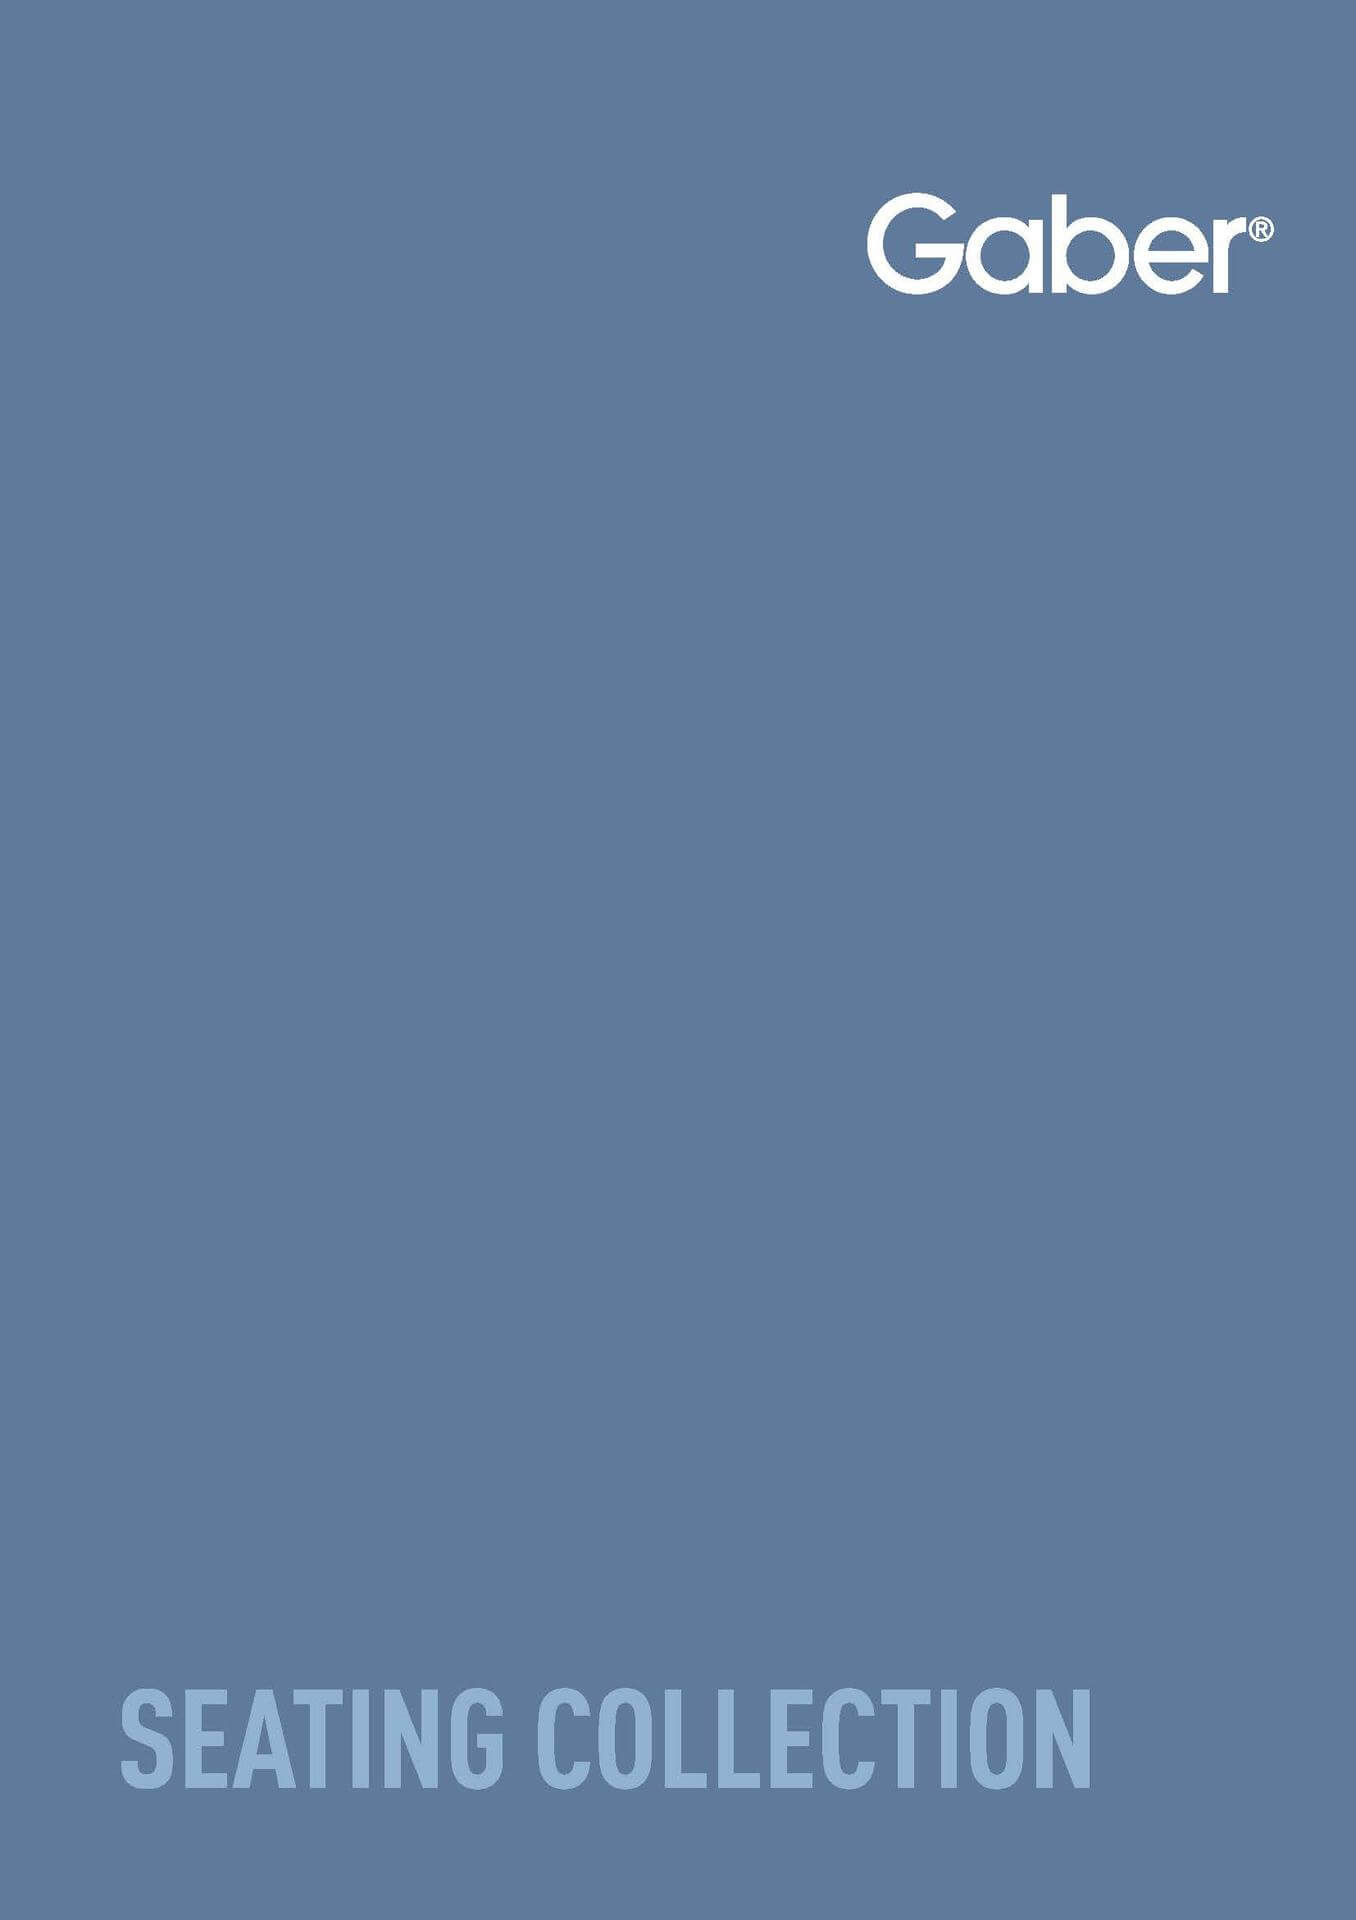 JCD Gaber Chaises restauration Page 001